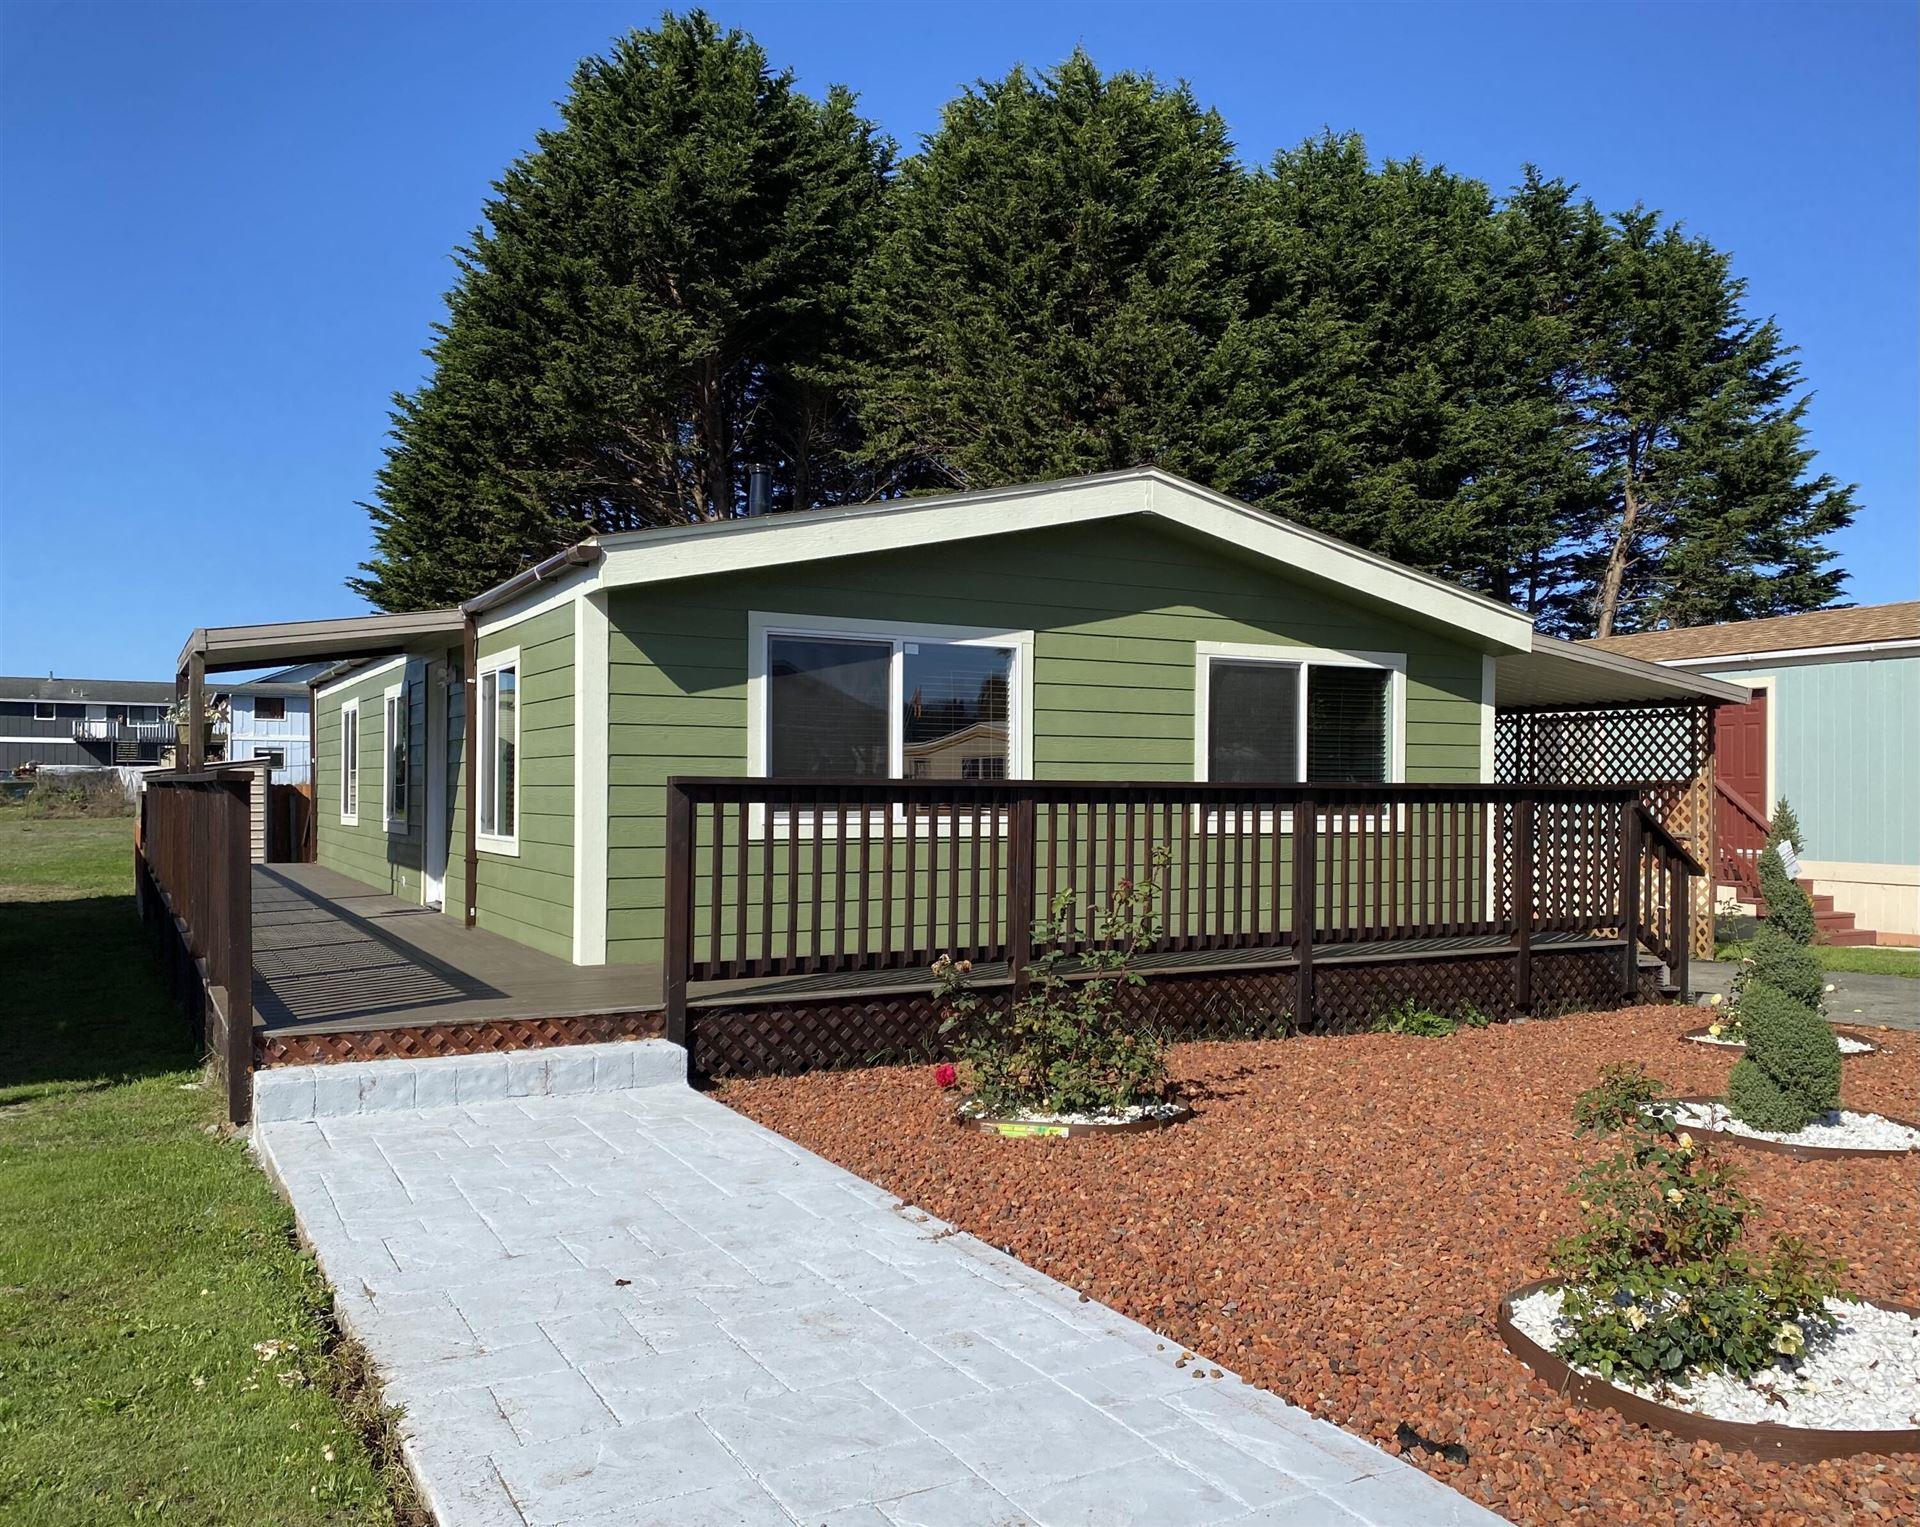 5039 Spruce Way, Arcata, CA 95521 - MLS#: 260336